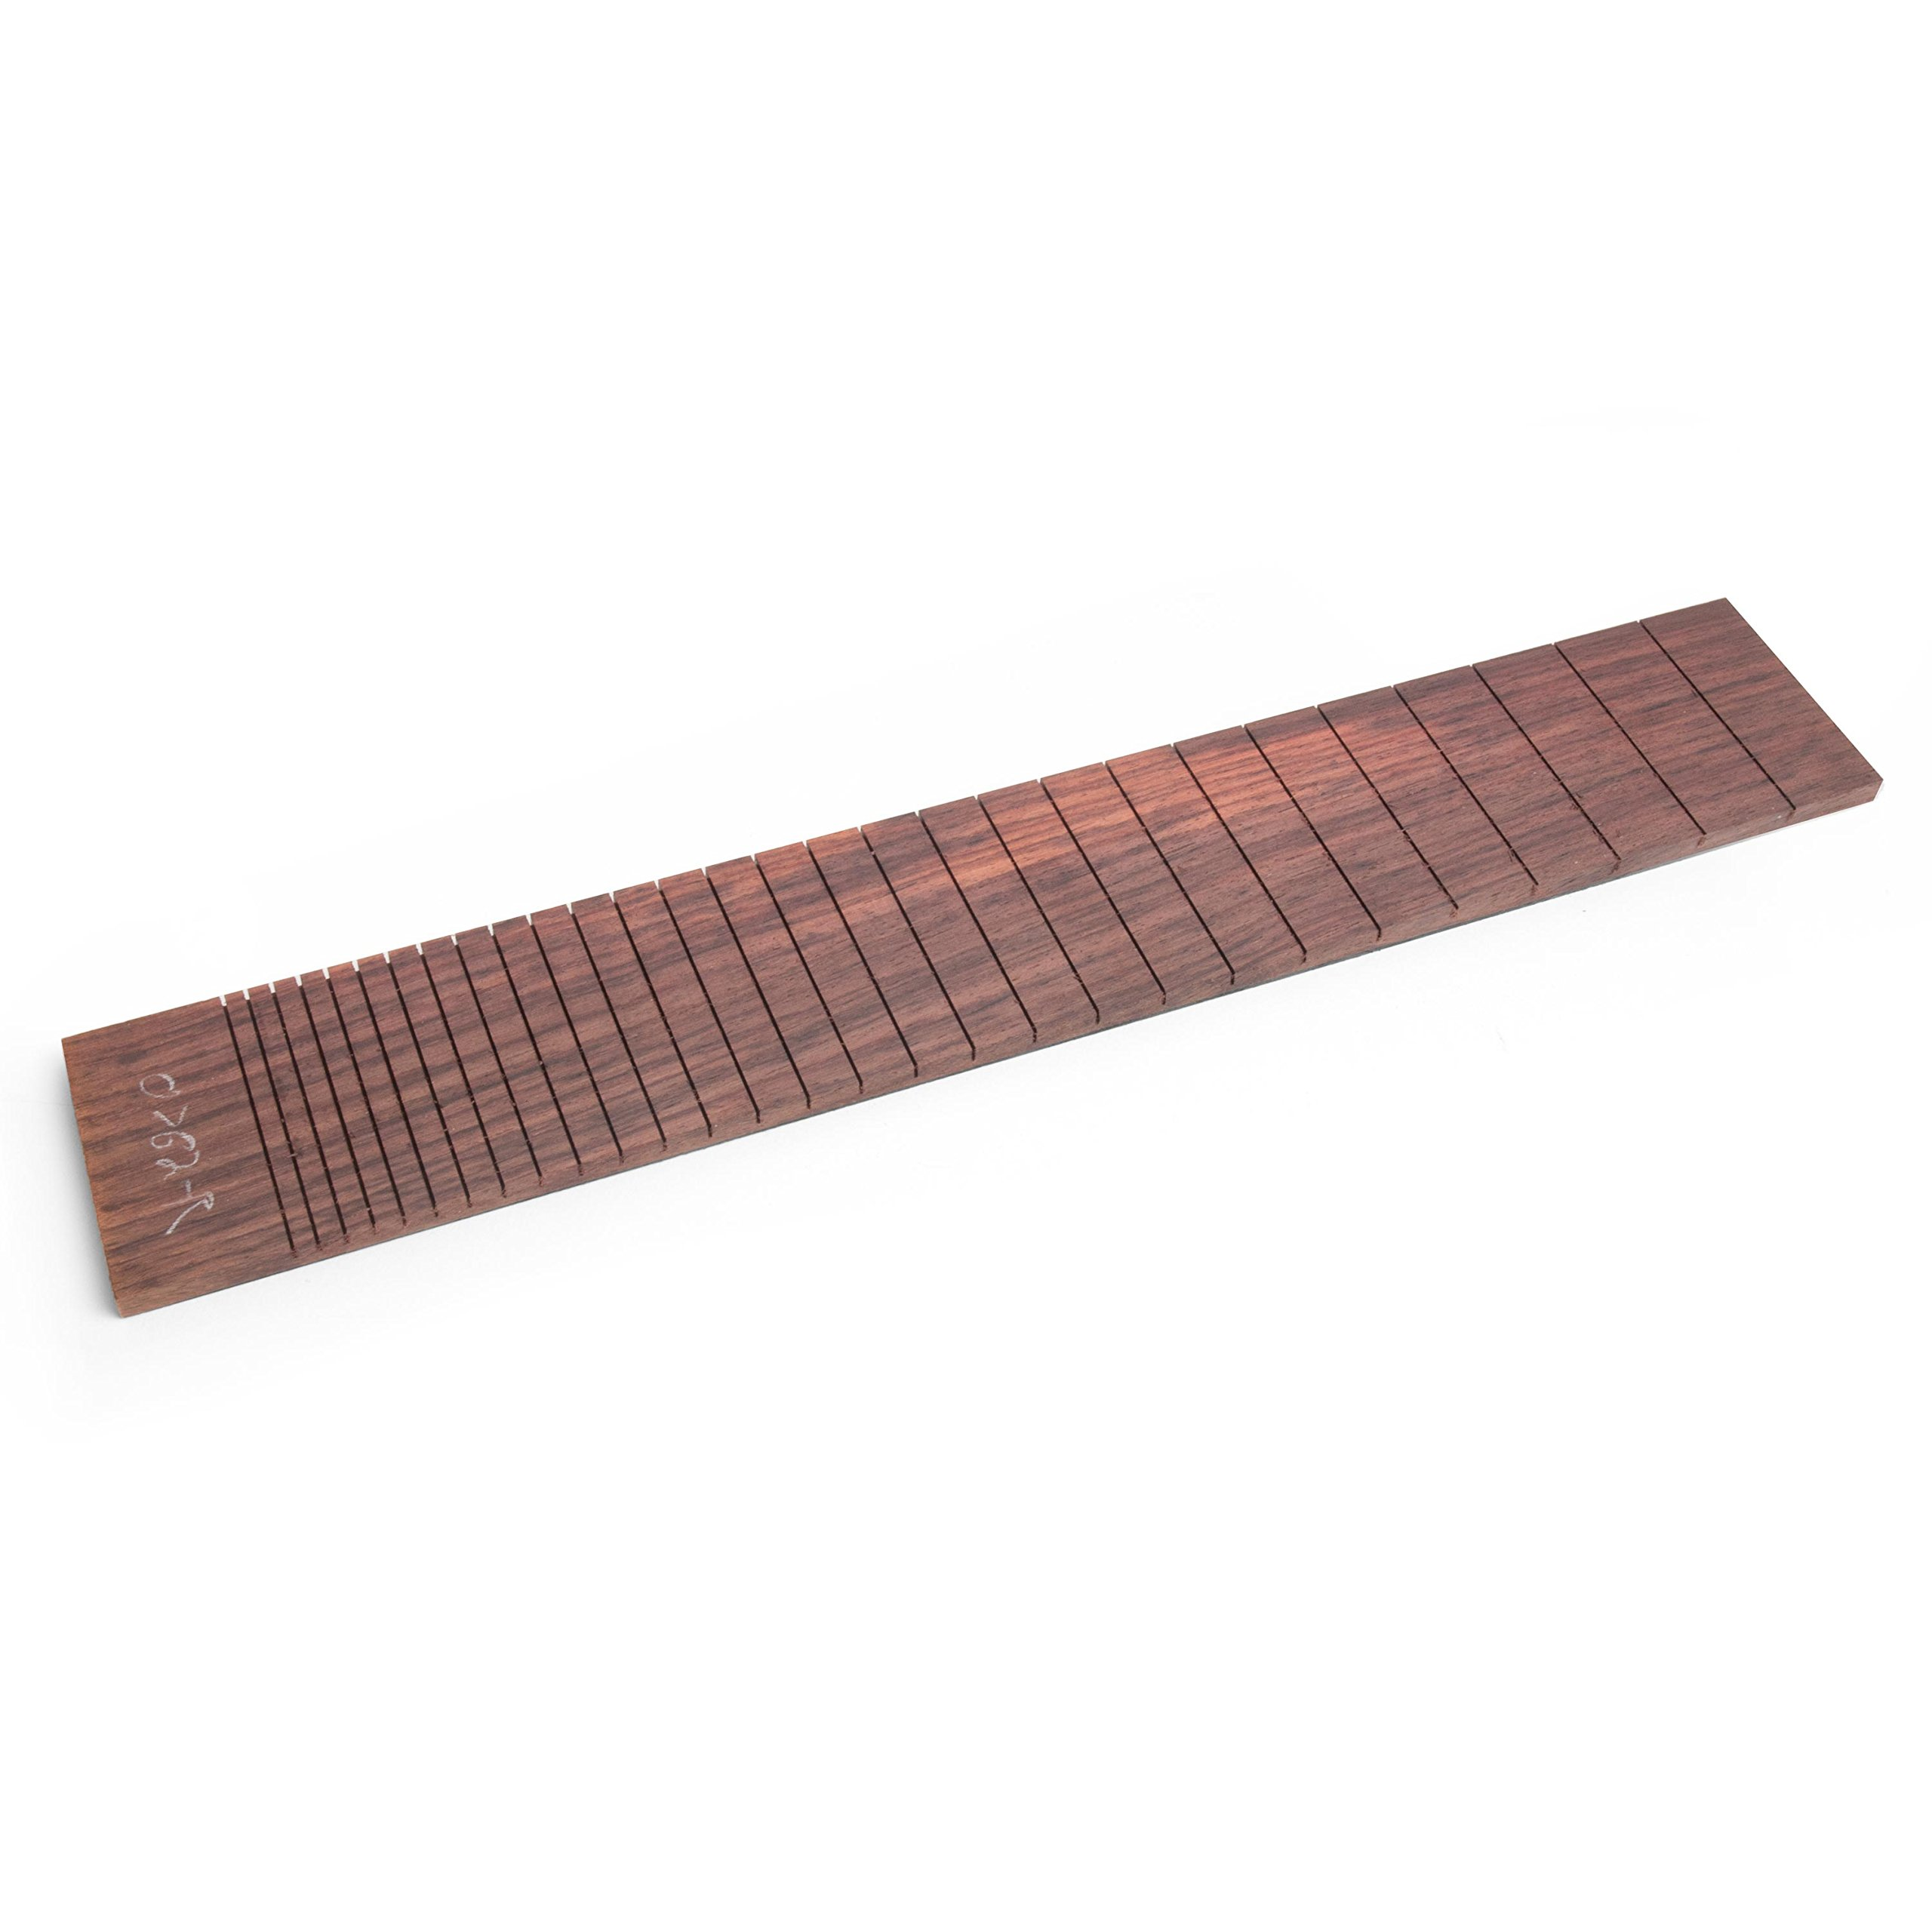 StewMac Mandolin Fingerboard, Rosewood, Flat